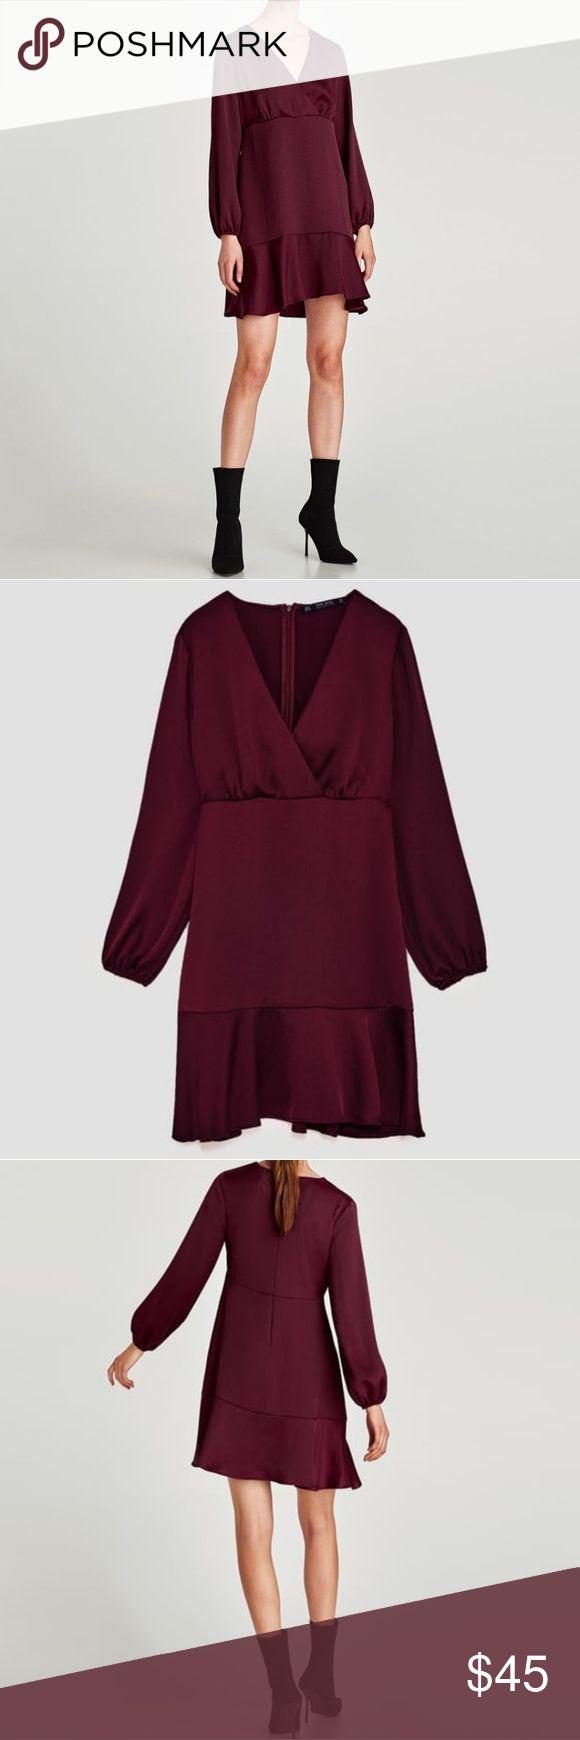 Zara Burgundy V-Neck Ruffle Dress Burgundy/Oxblood Dress from Zara.  Size M 100% polyester  New w tags! Zara Dresses Long Sleeve